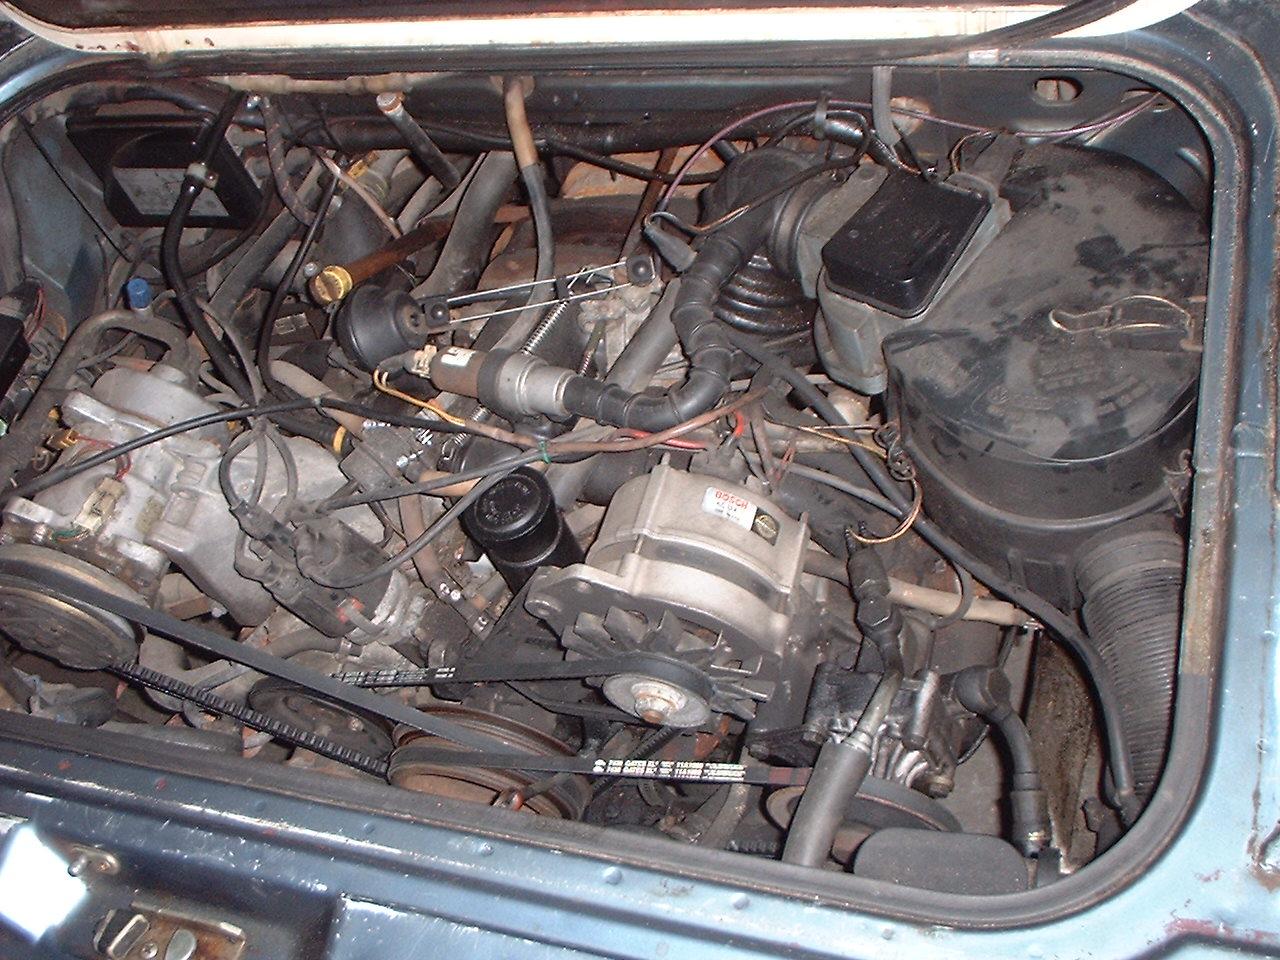 85 Vanagon Engine Diagram | Wiring Diagram - Vw Subaru Conversion Wiring Diagram